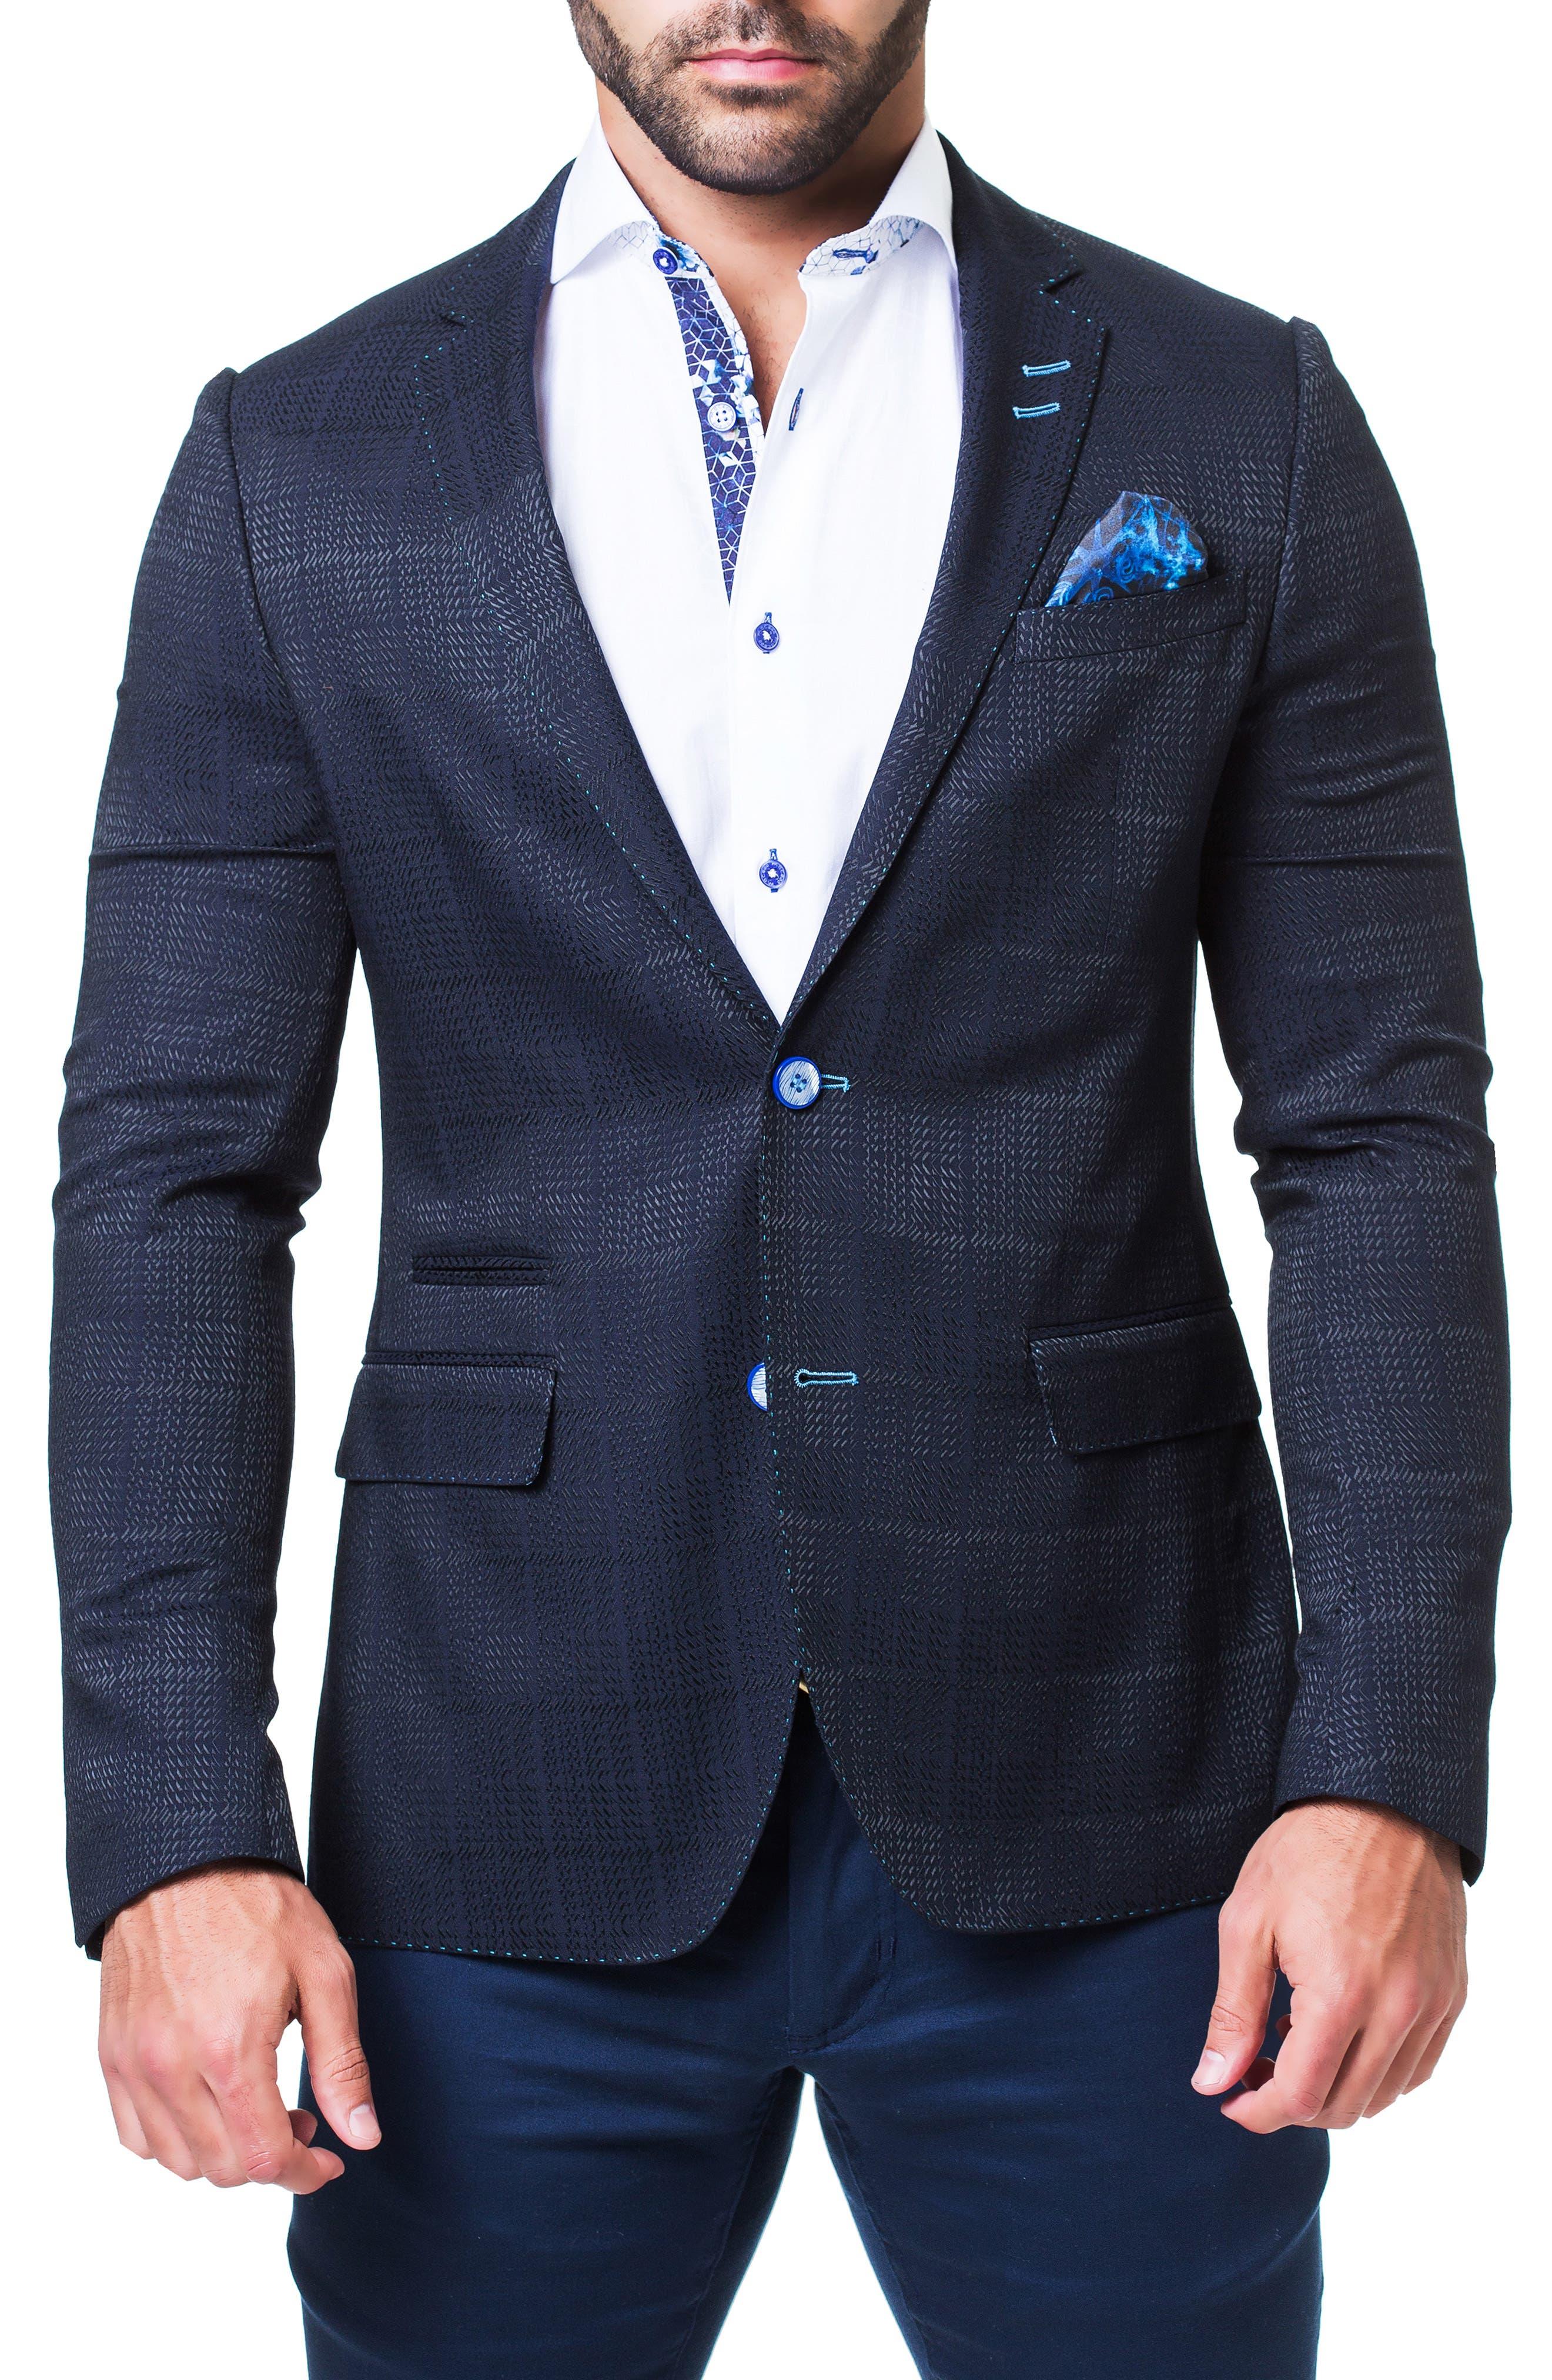 MACEOO Socrate Tremble Jacquard Sport Coat in Blue